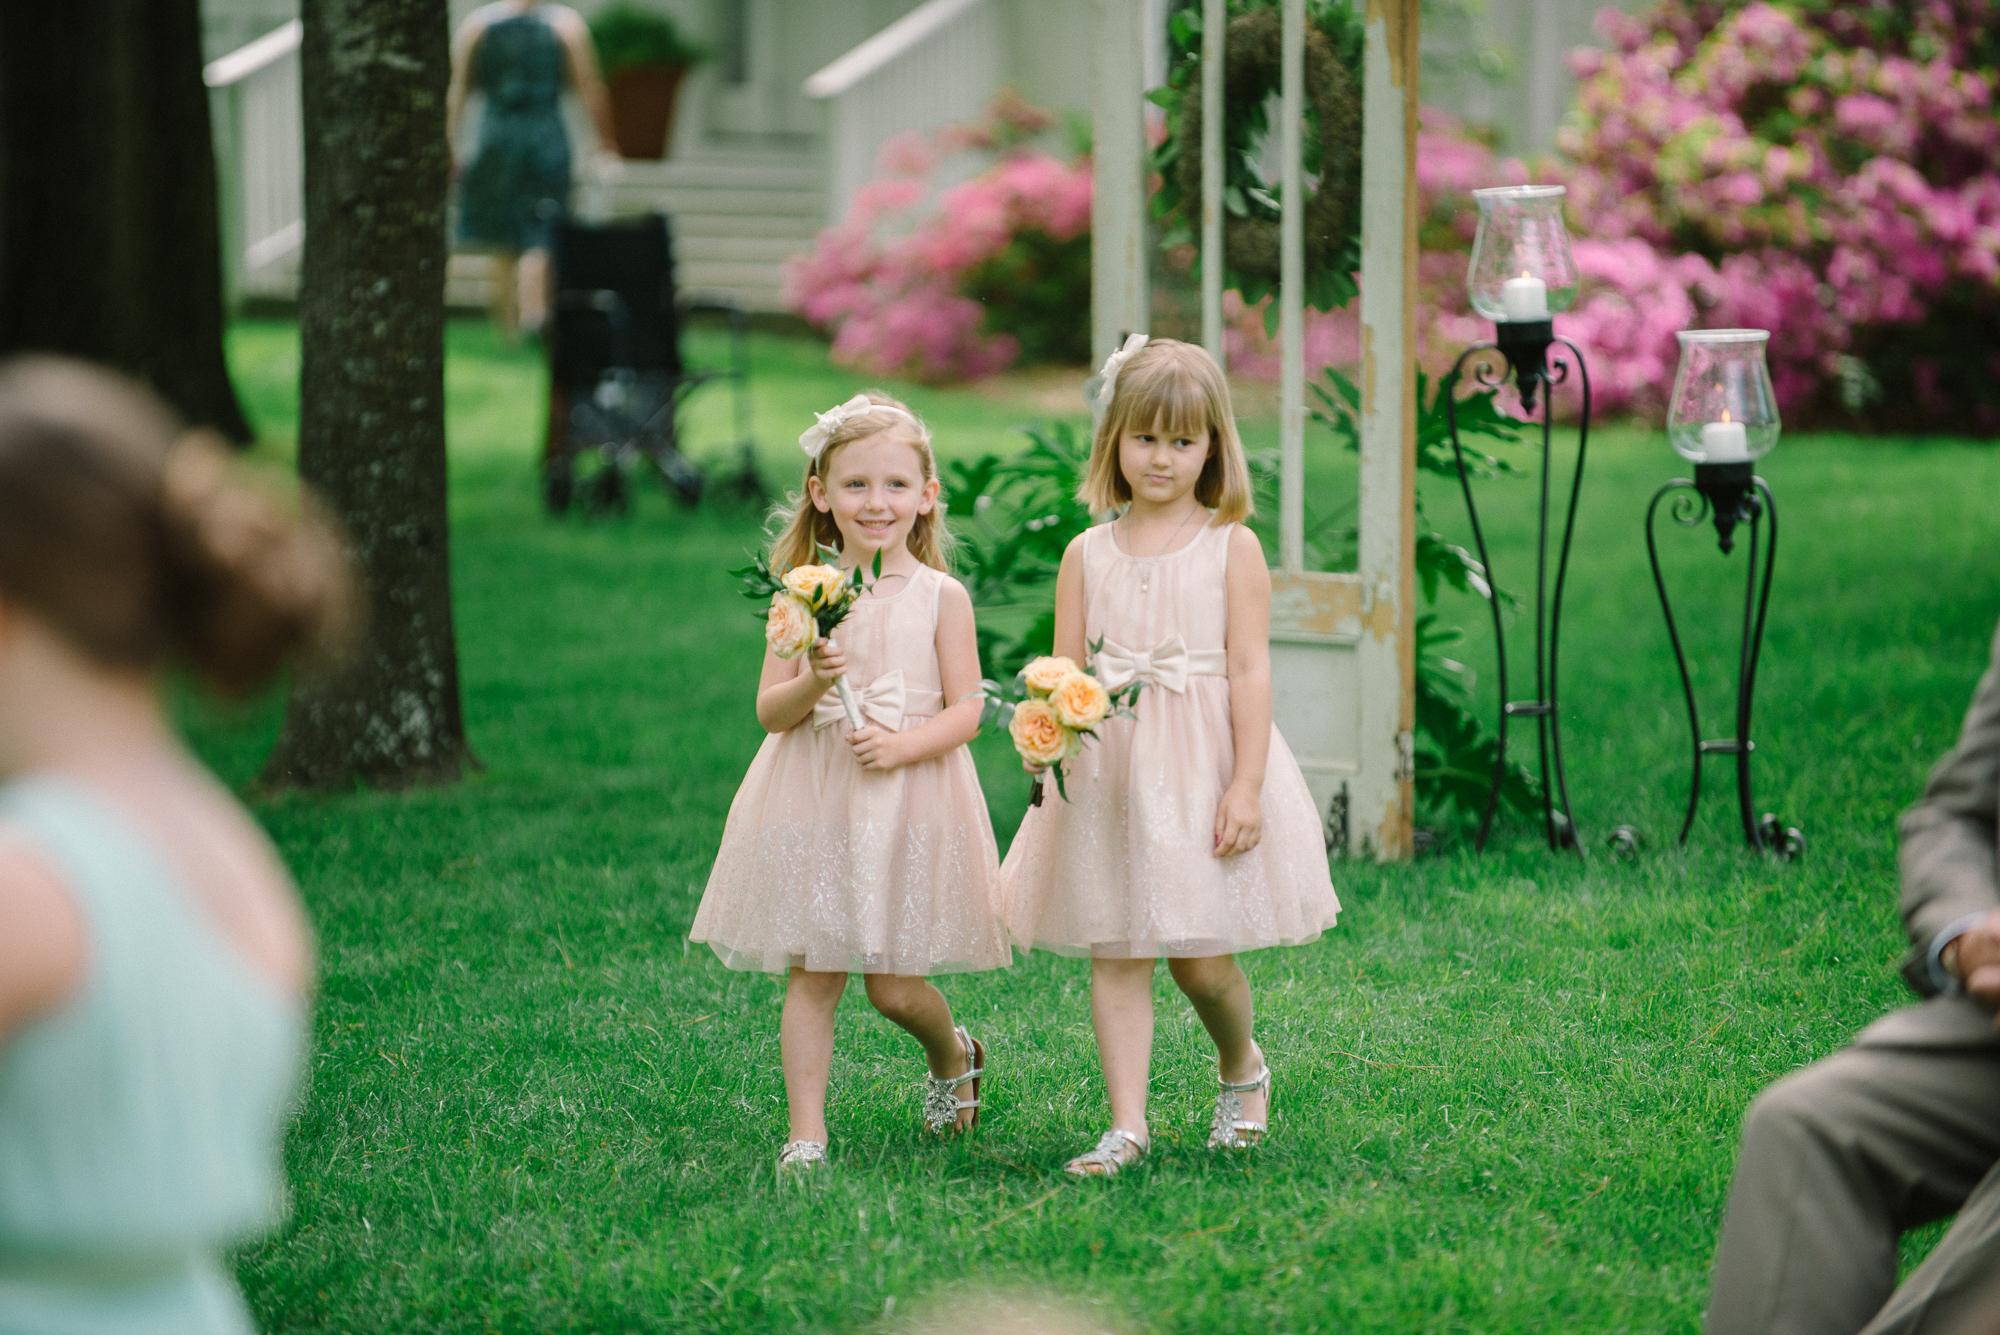 Langley-Smith-wedding-blog-19.jpg